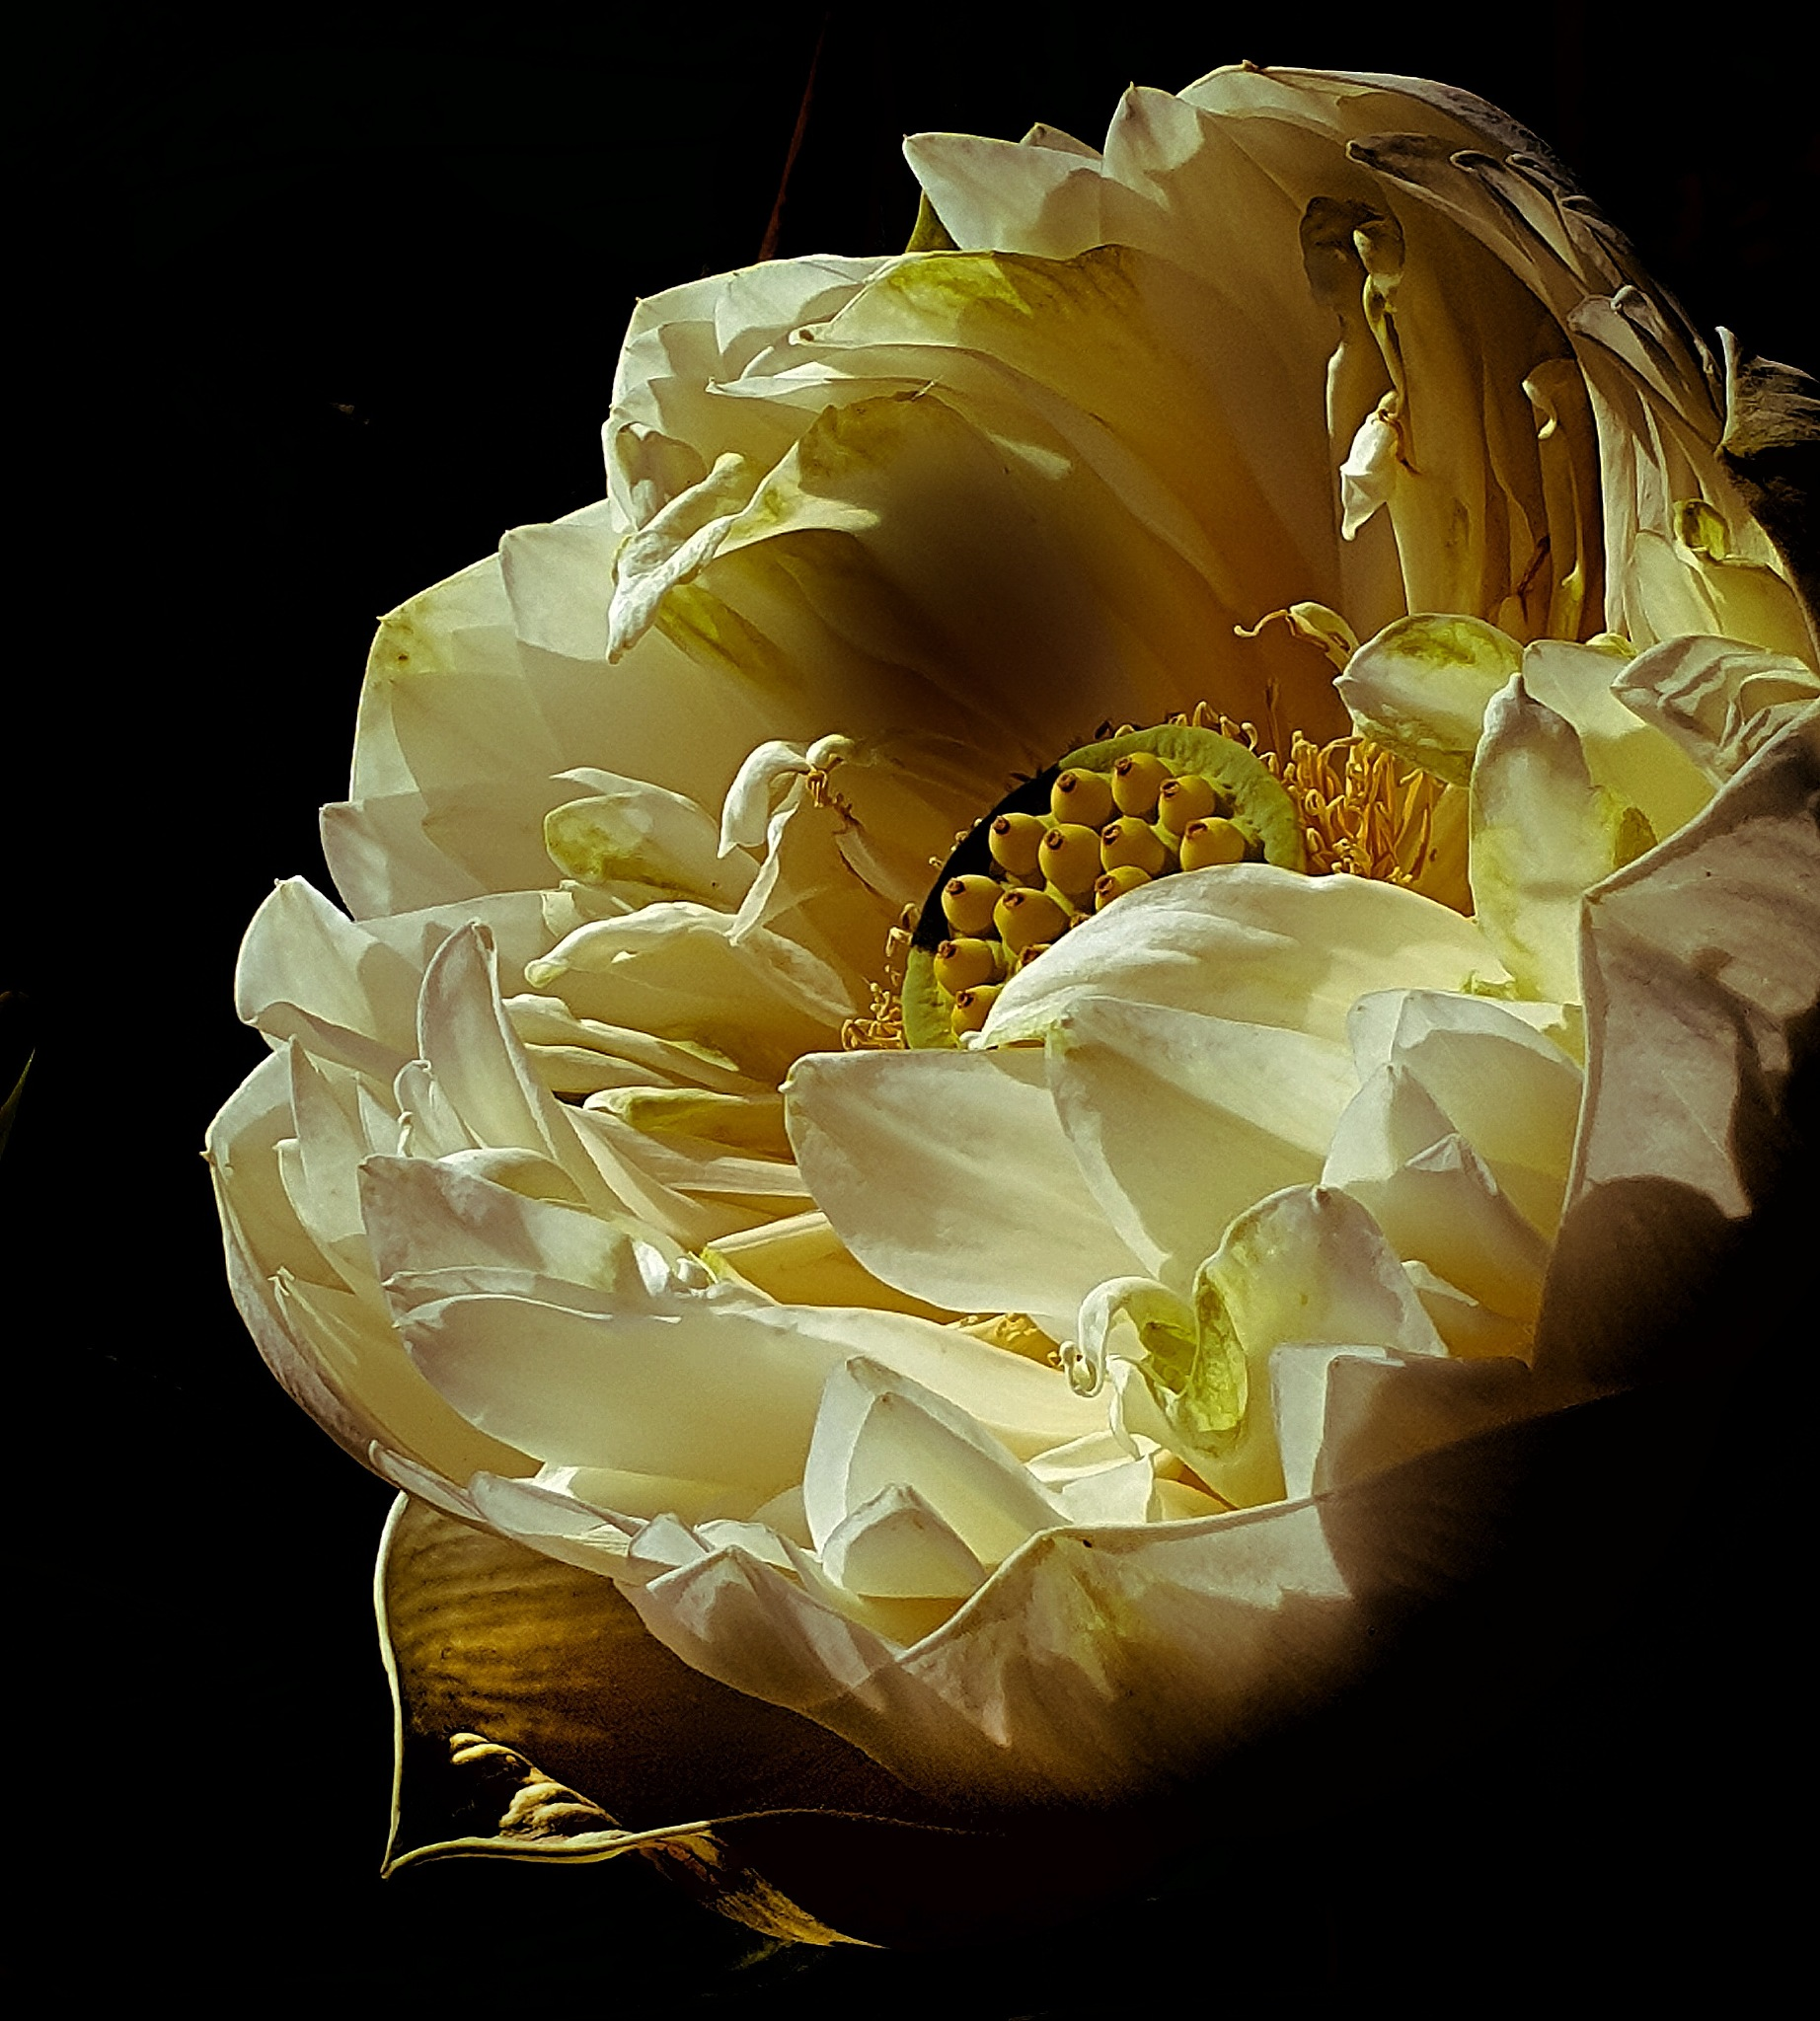 Good night !! by Claudia Farolfi